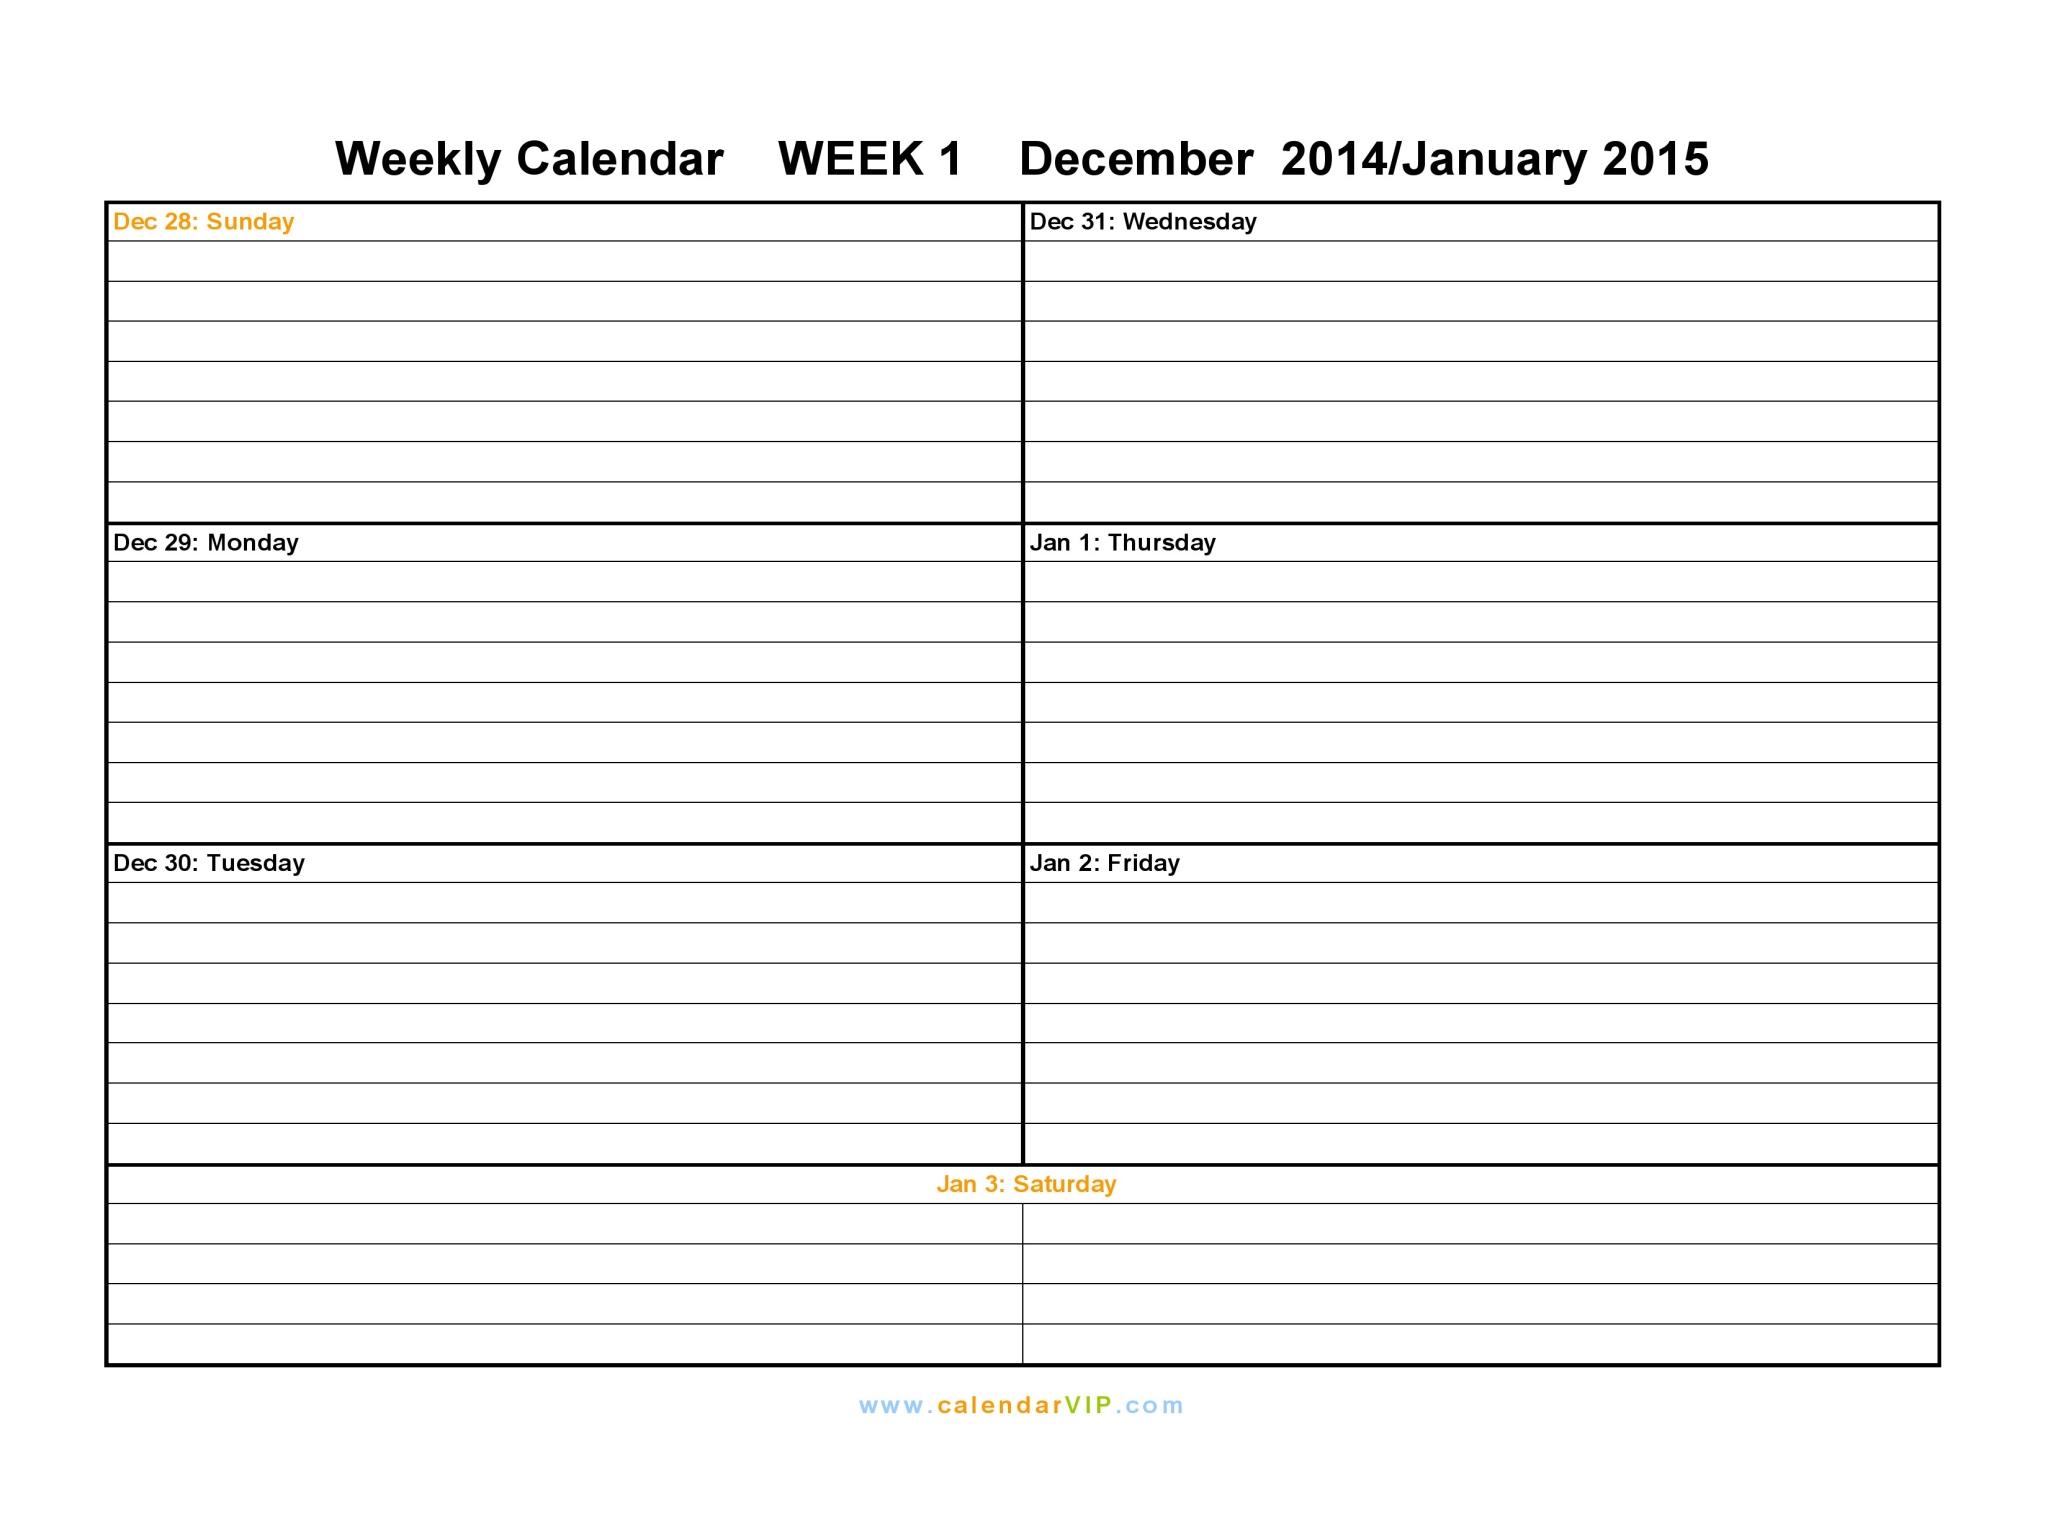 Weekly Calendar 2015 - Free Weekly Calendar Templates